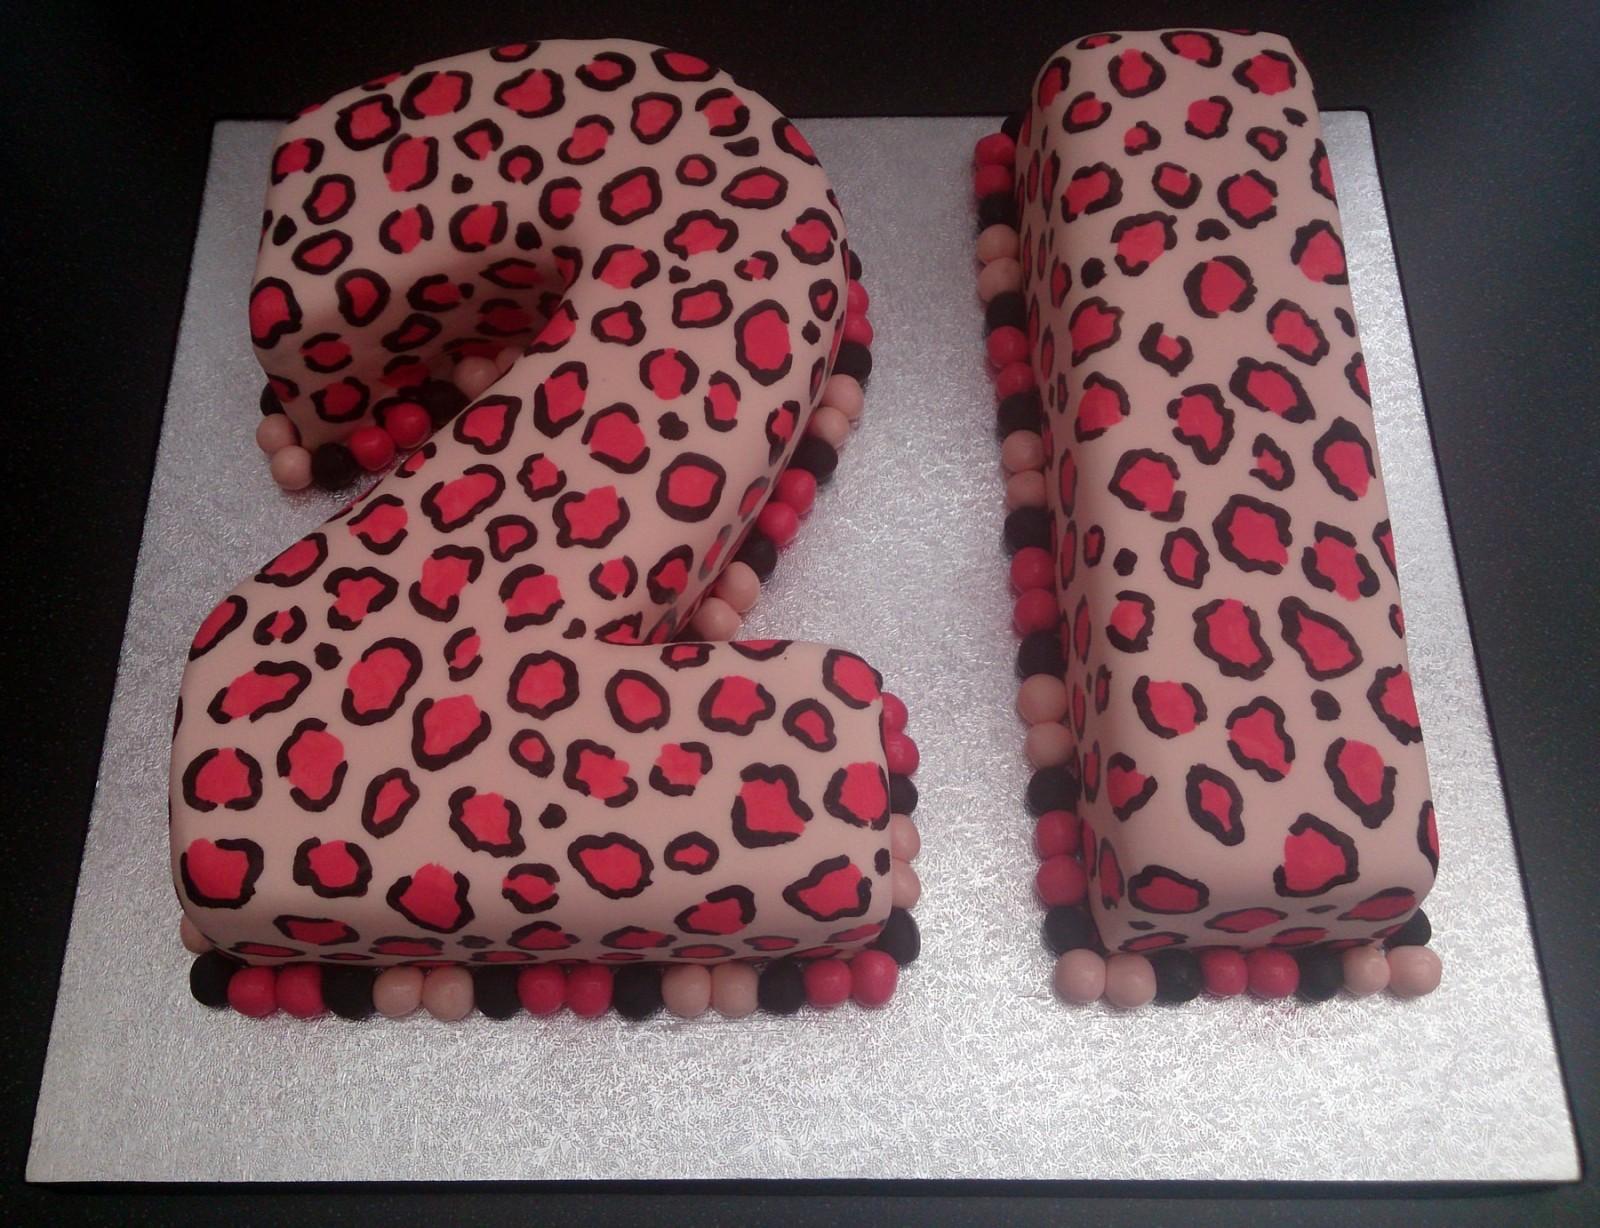 Leopard Print 21st Birthday Cake 171 Susie S Cakes